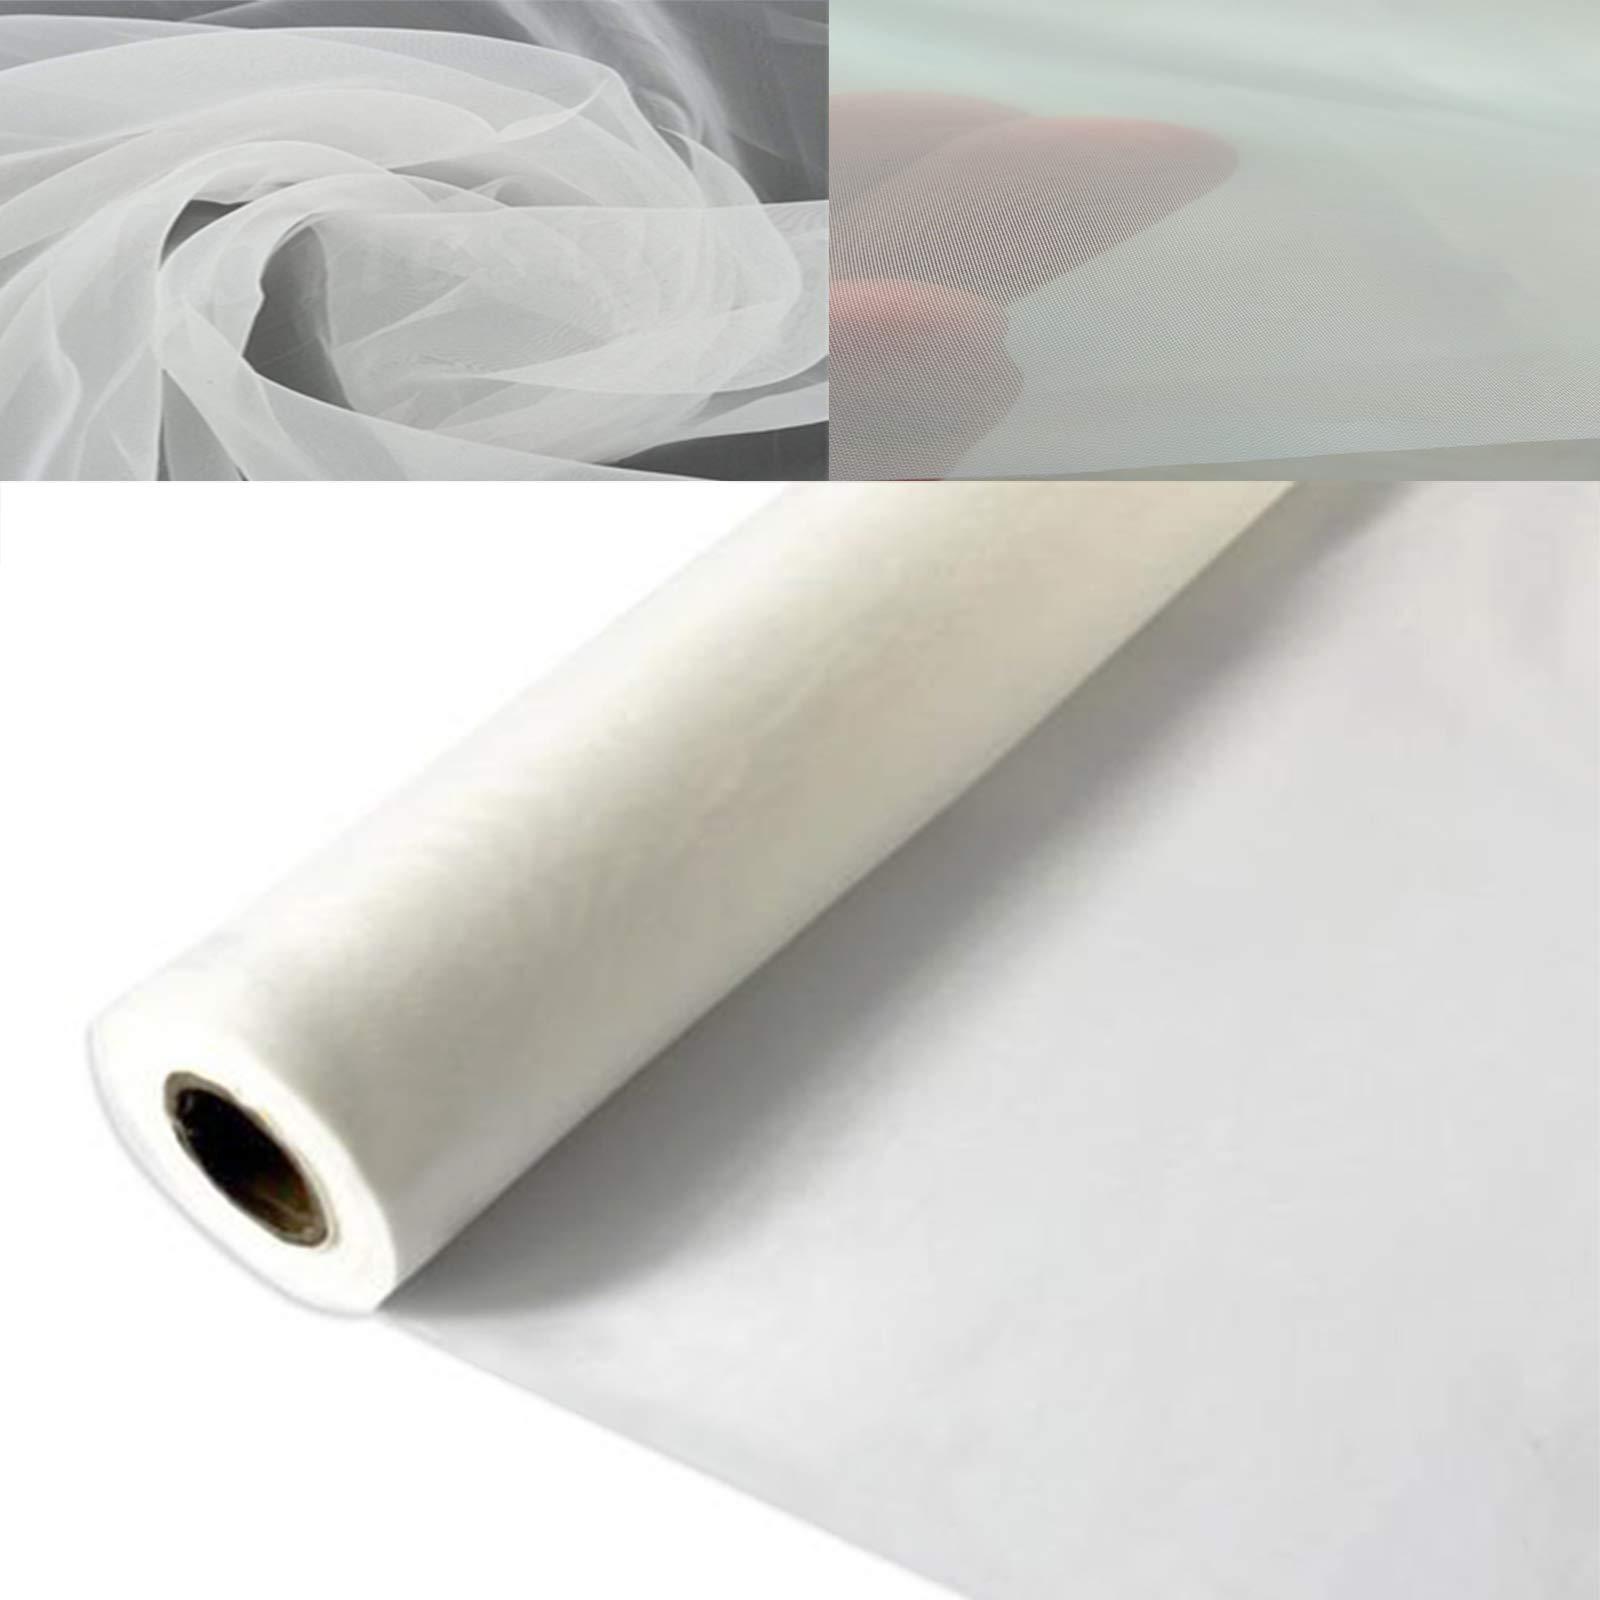 3 Yards 1.27 Meters Silk Screen Printing Fabric Mesh Screen Printing Mesh Wide High Tension Mesh Making Ink Supplies 110 Mesh(43T)